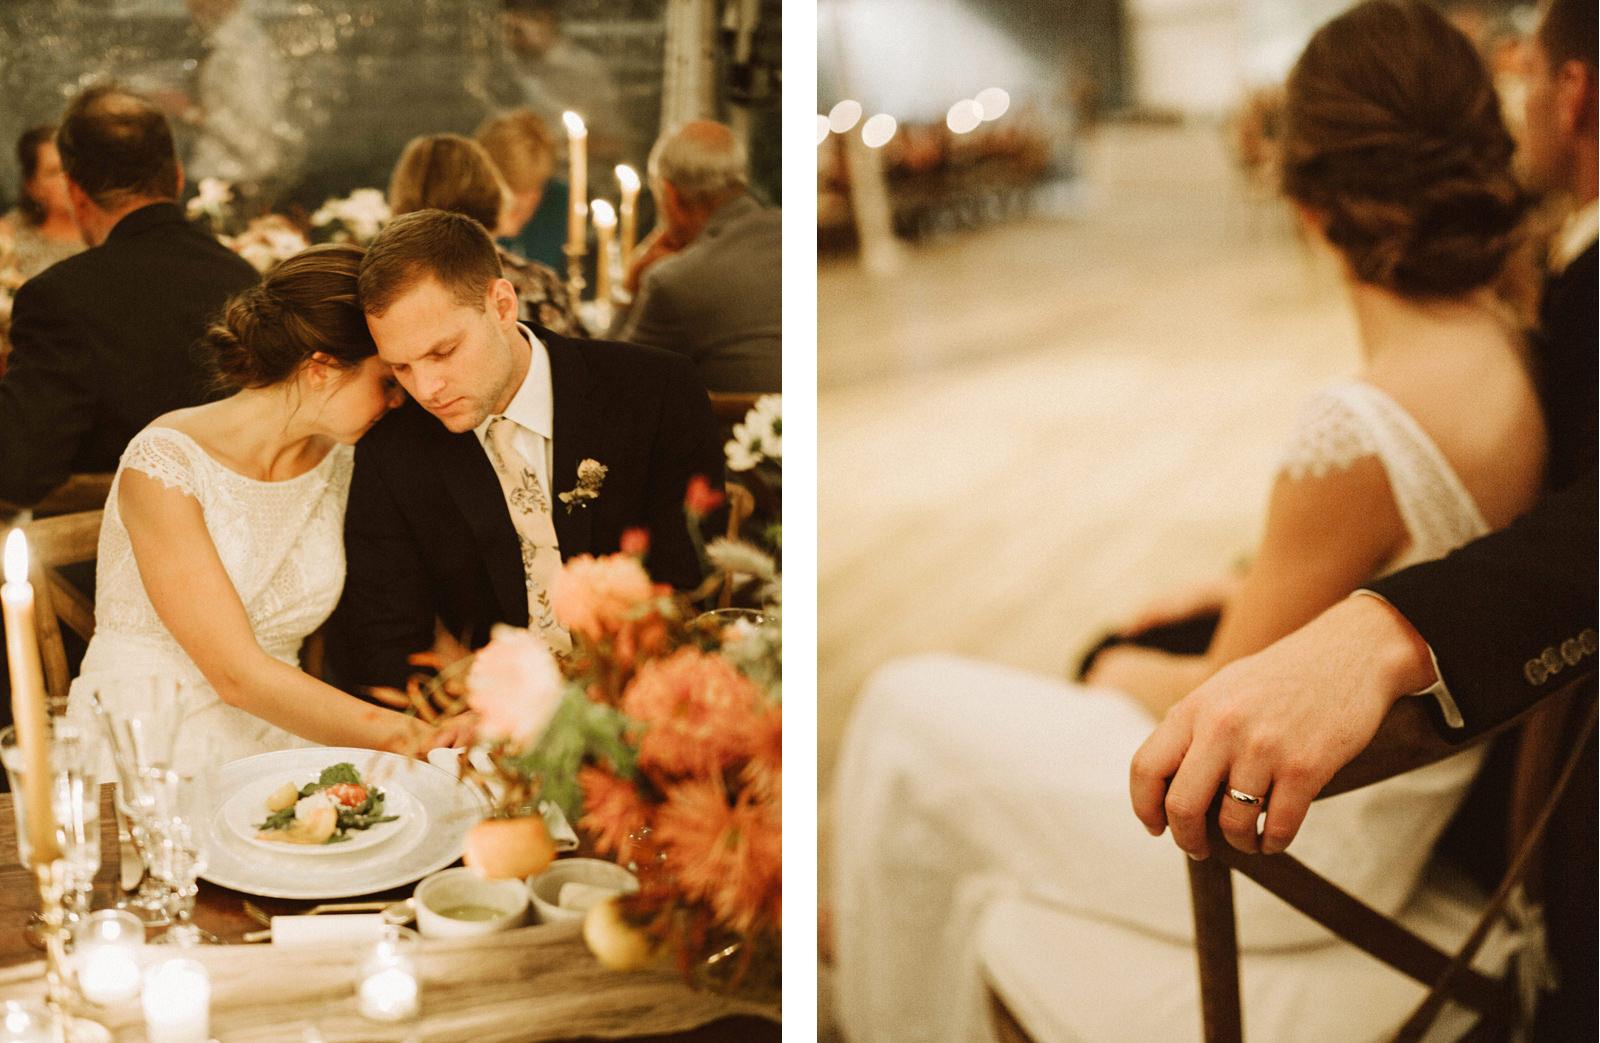 bridgeport-wedding-149 BRIDGEPORT, CONNECTICUT BACKYARD WEDDING